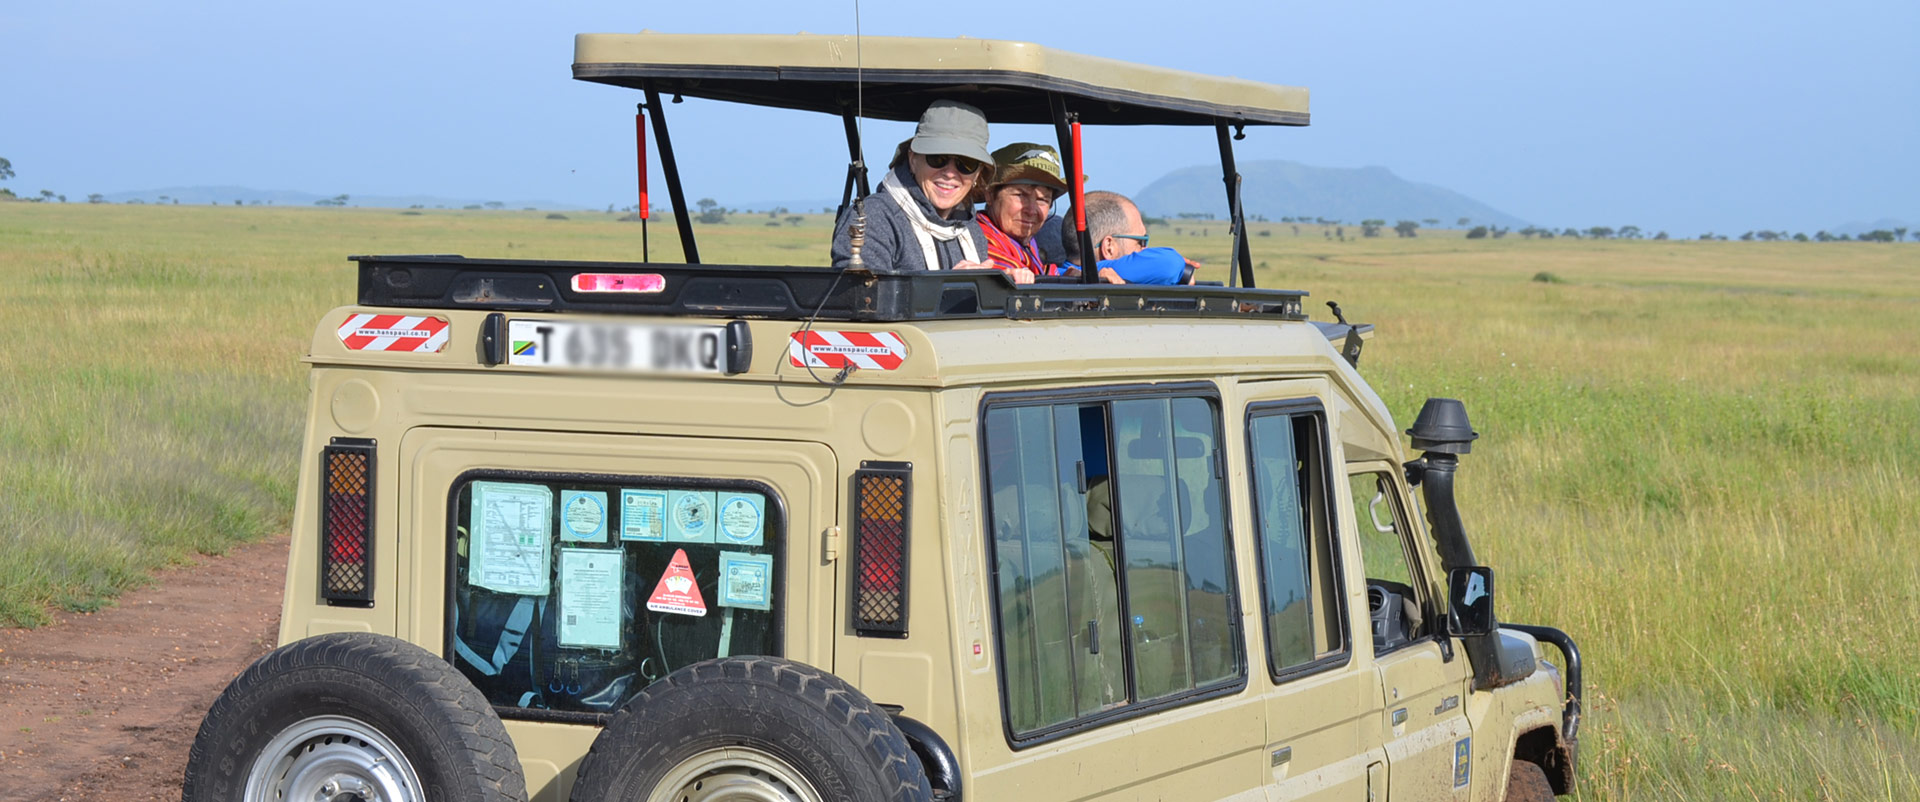 Exciting Game Viewing Safaris